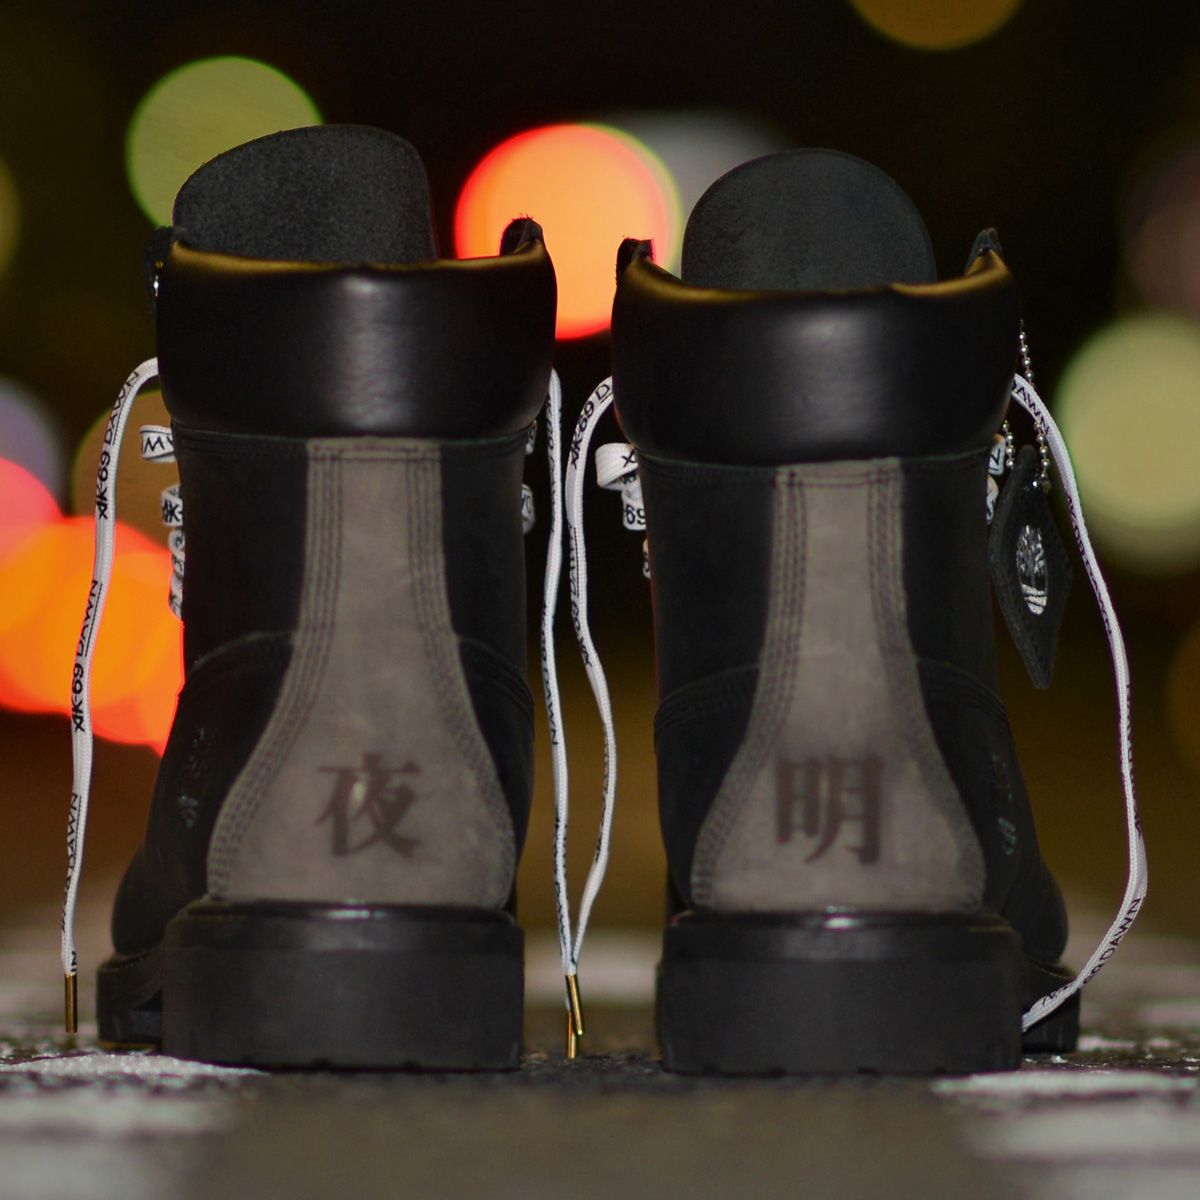 Timberland AK-69×atmos Custom 6inch Boot(ティンバーランド AK-69×アトモス カスタム 6インチ ブーツ)BLACK SMOOTH/DARK GRAY SMOOTH【レディース ブーツ】17HO-S